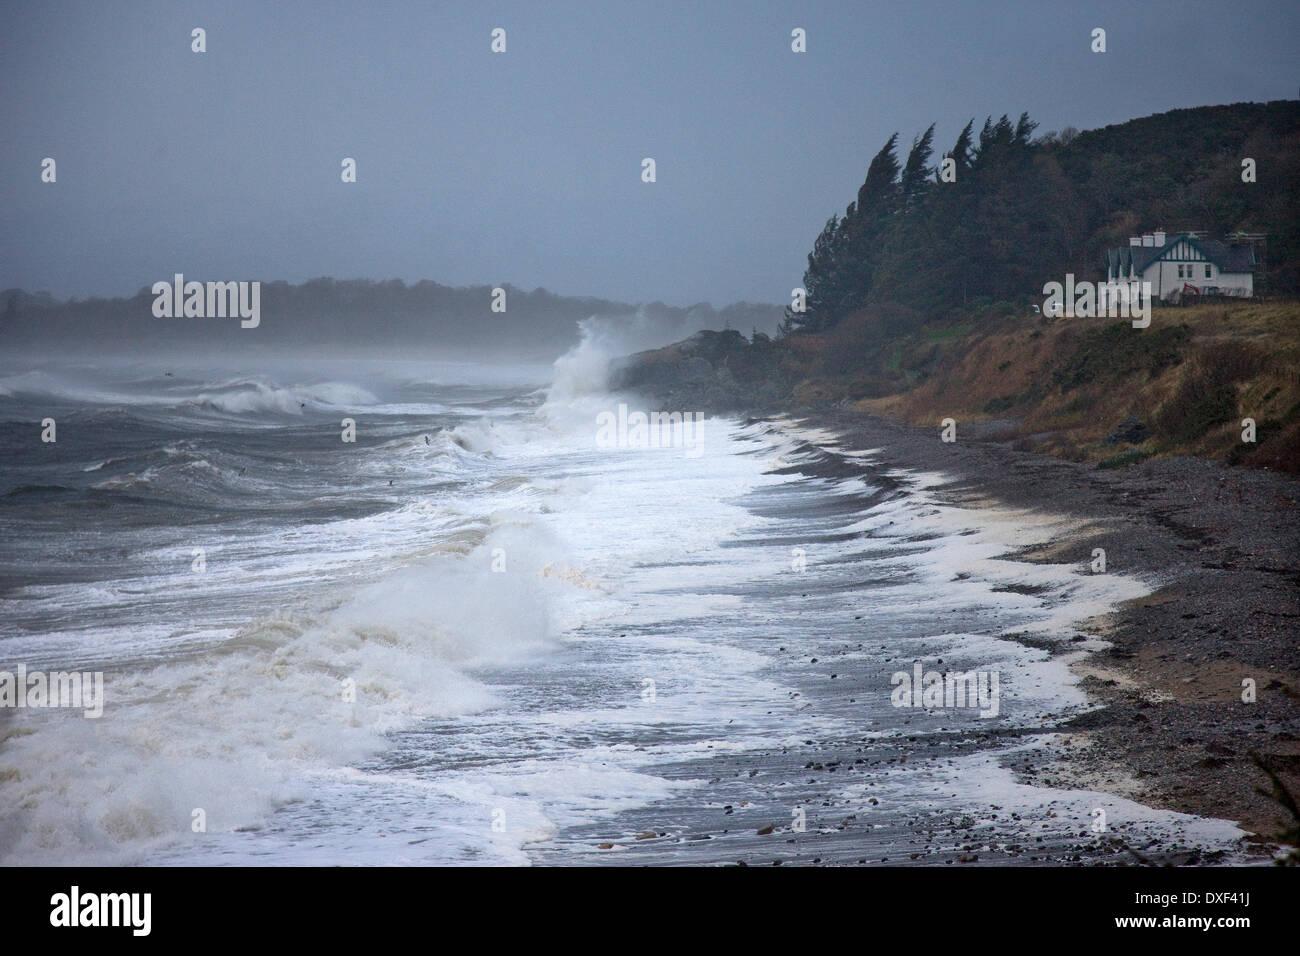 Rough storm force seas, Ardmucknish bay off Benderloch,Argyll - Stock Image